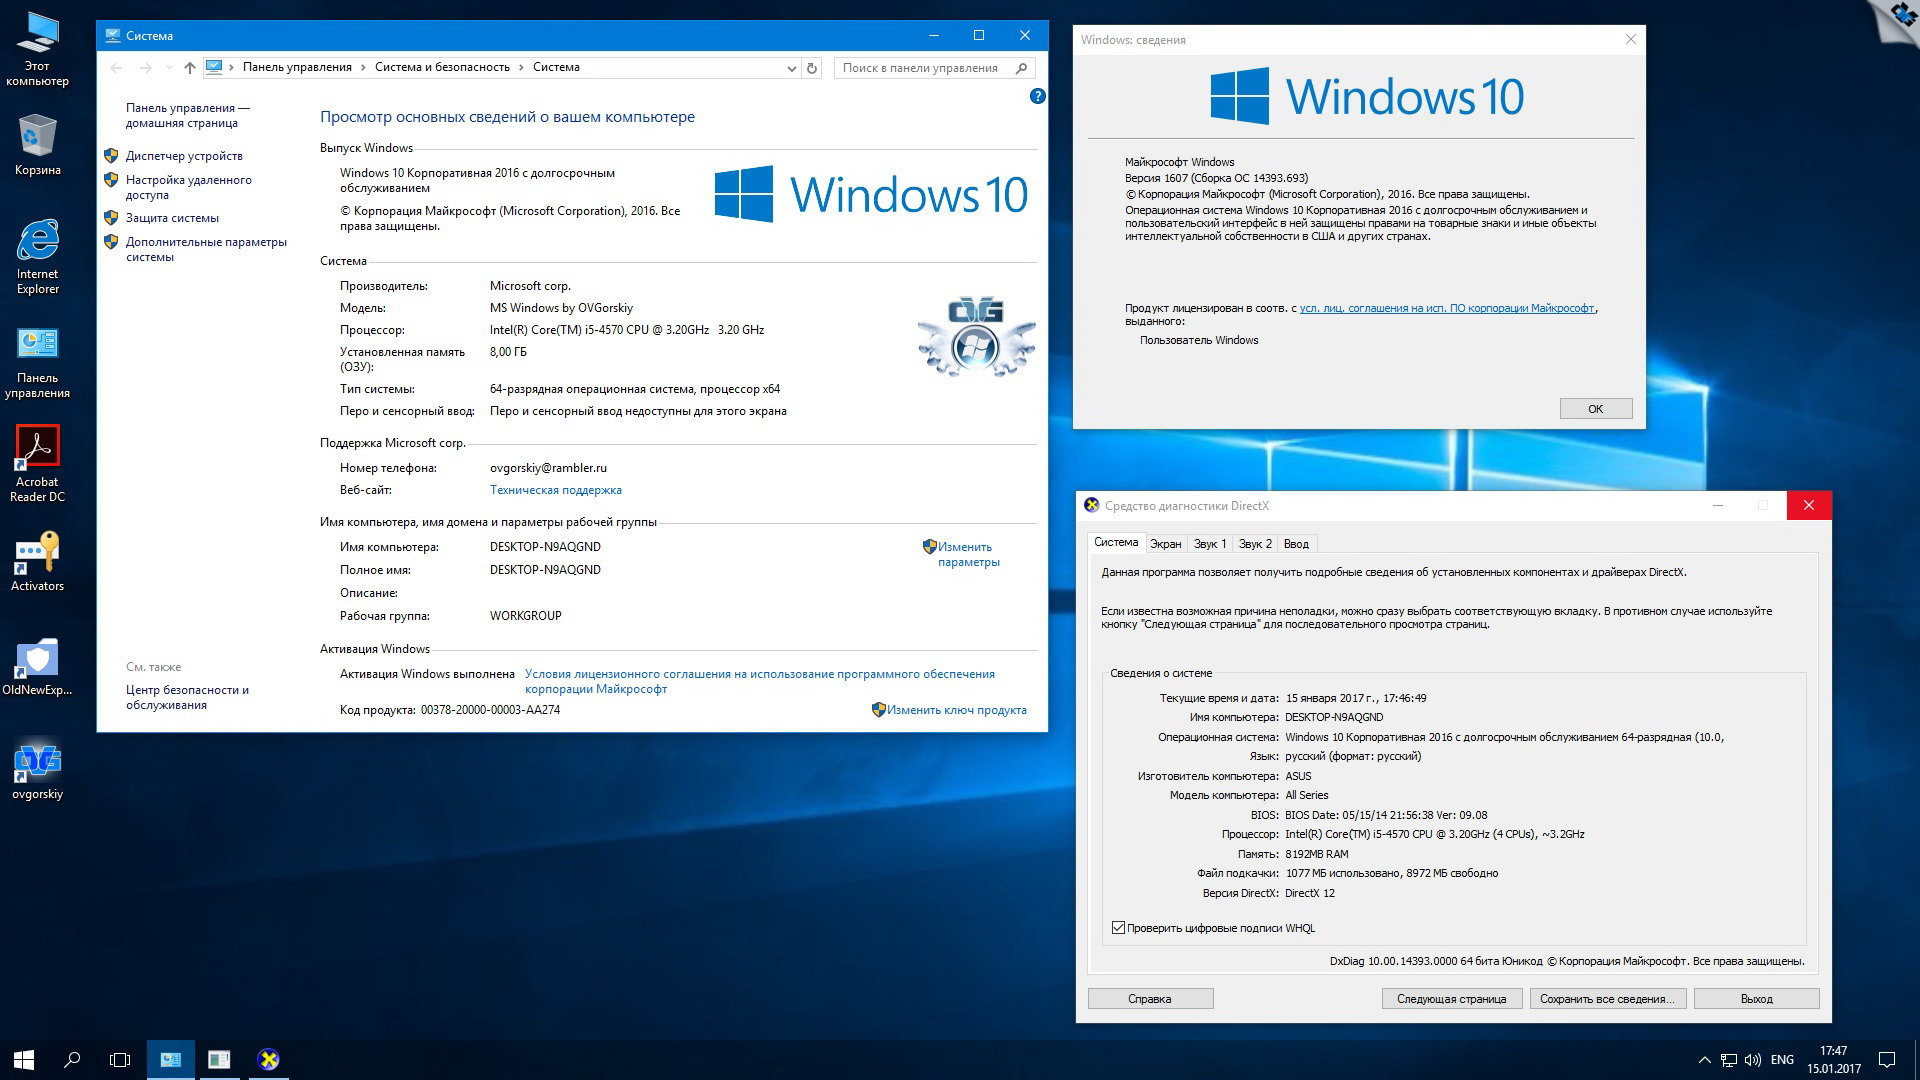 Microsoft Windows 10 Enterprise LTSB x86-x64 1607 RU Office16 v